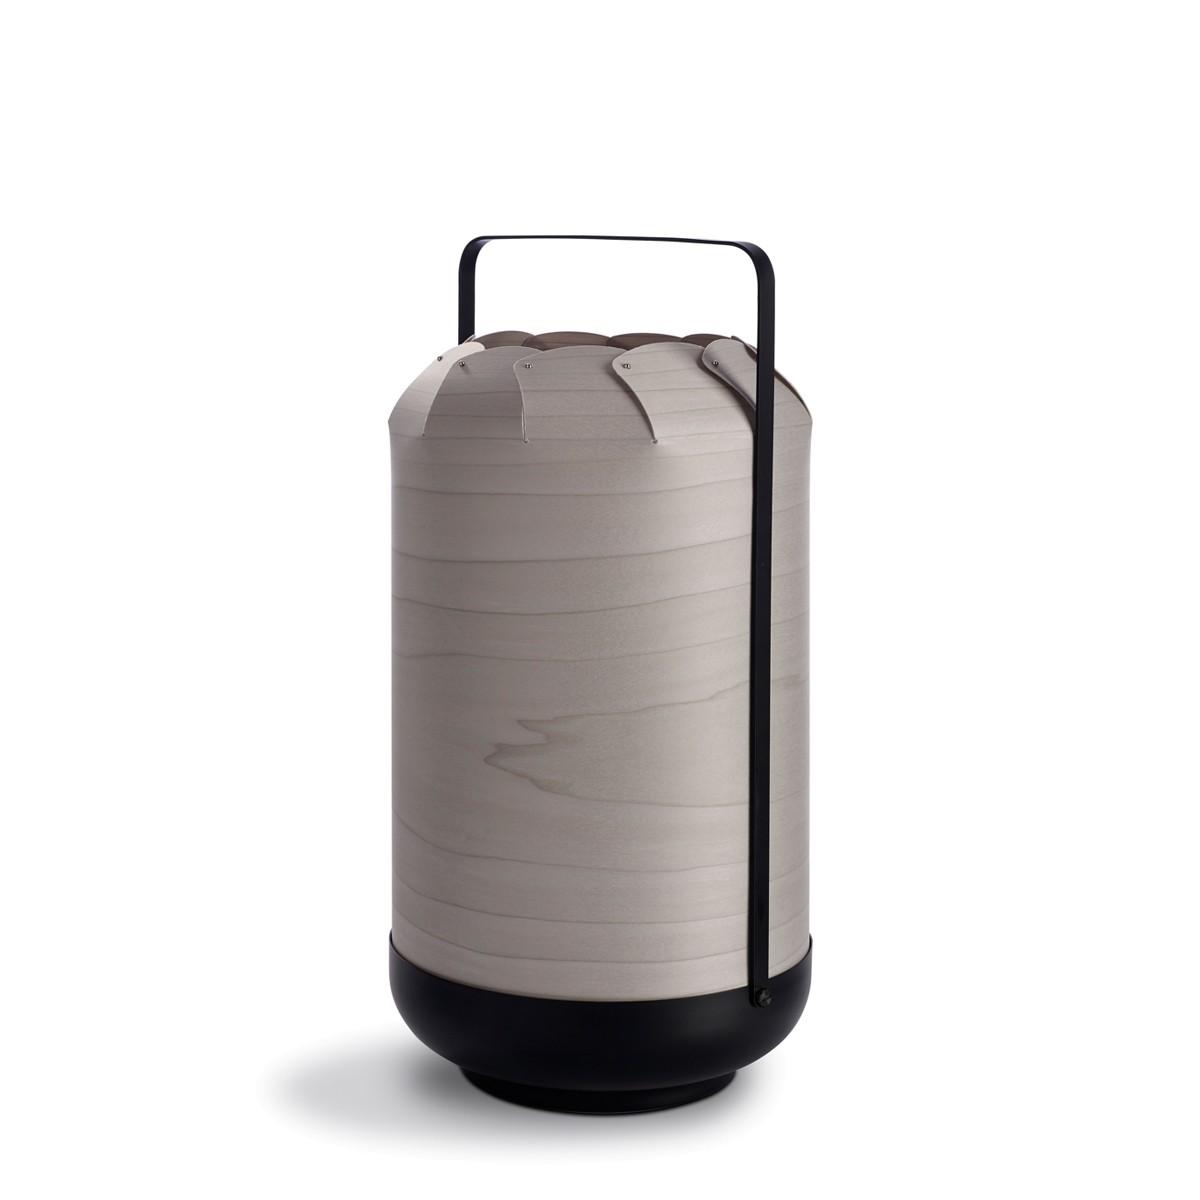 LZF Lamps Chou Tall Tischleuchte, grau